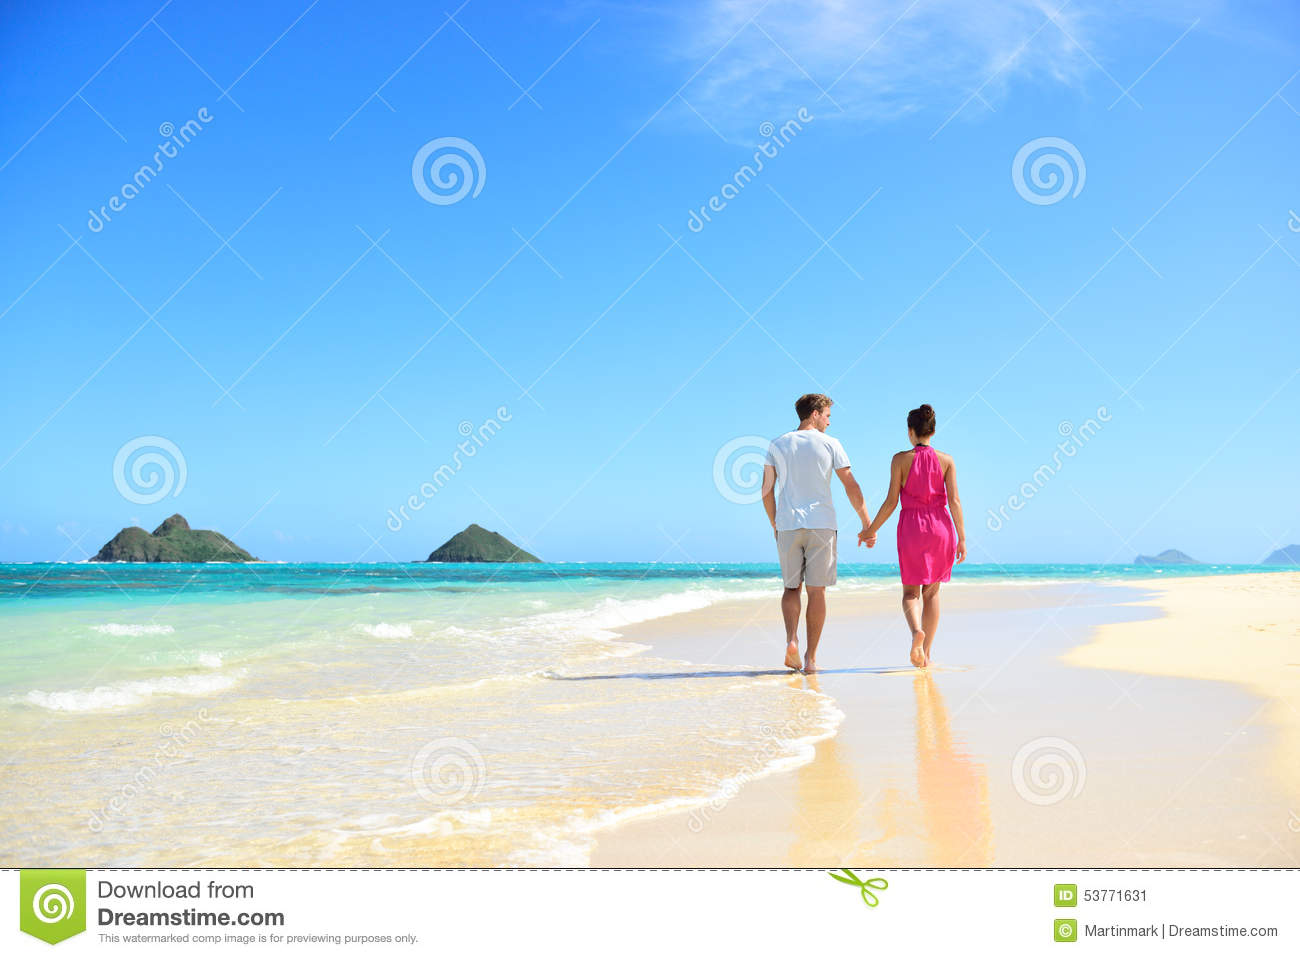 beach-couple-holding-hands-walking-hawaii.jpg